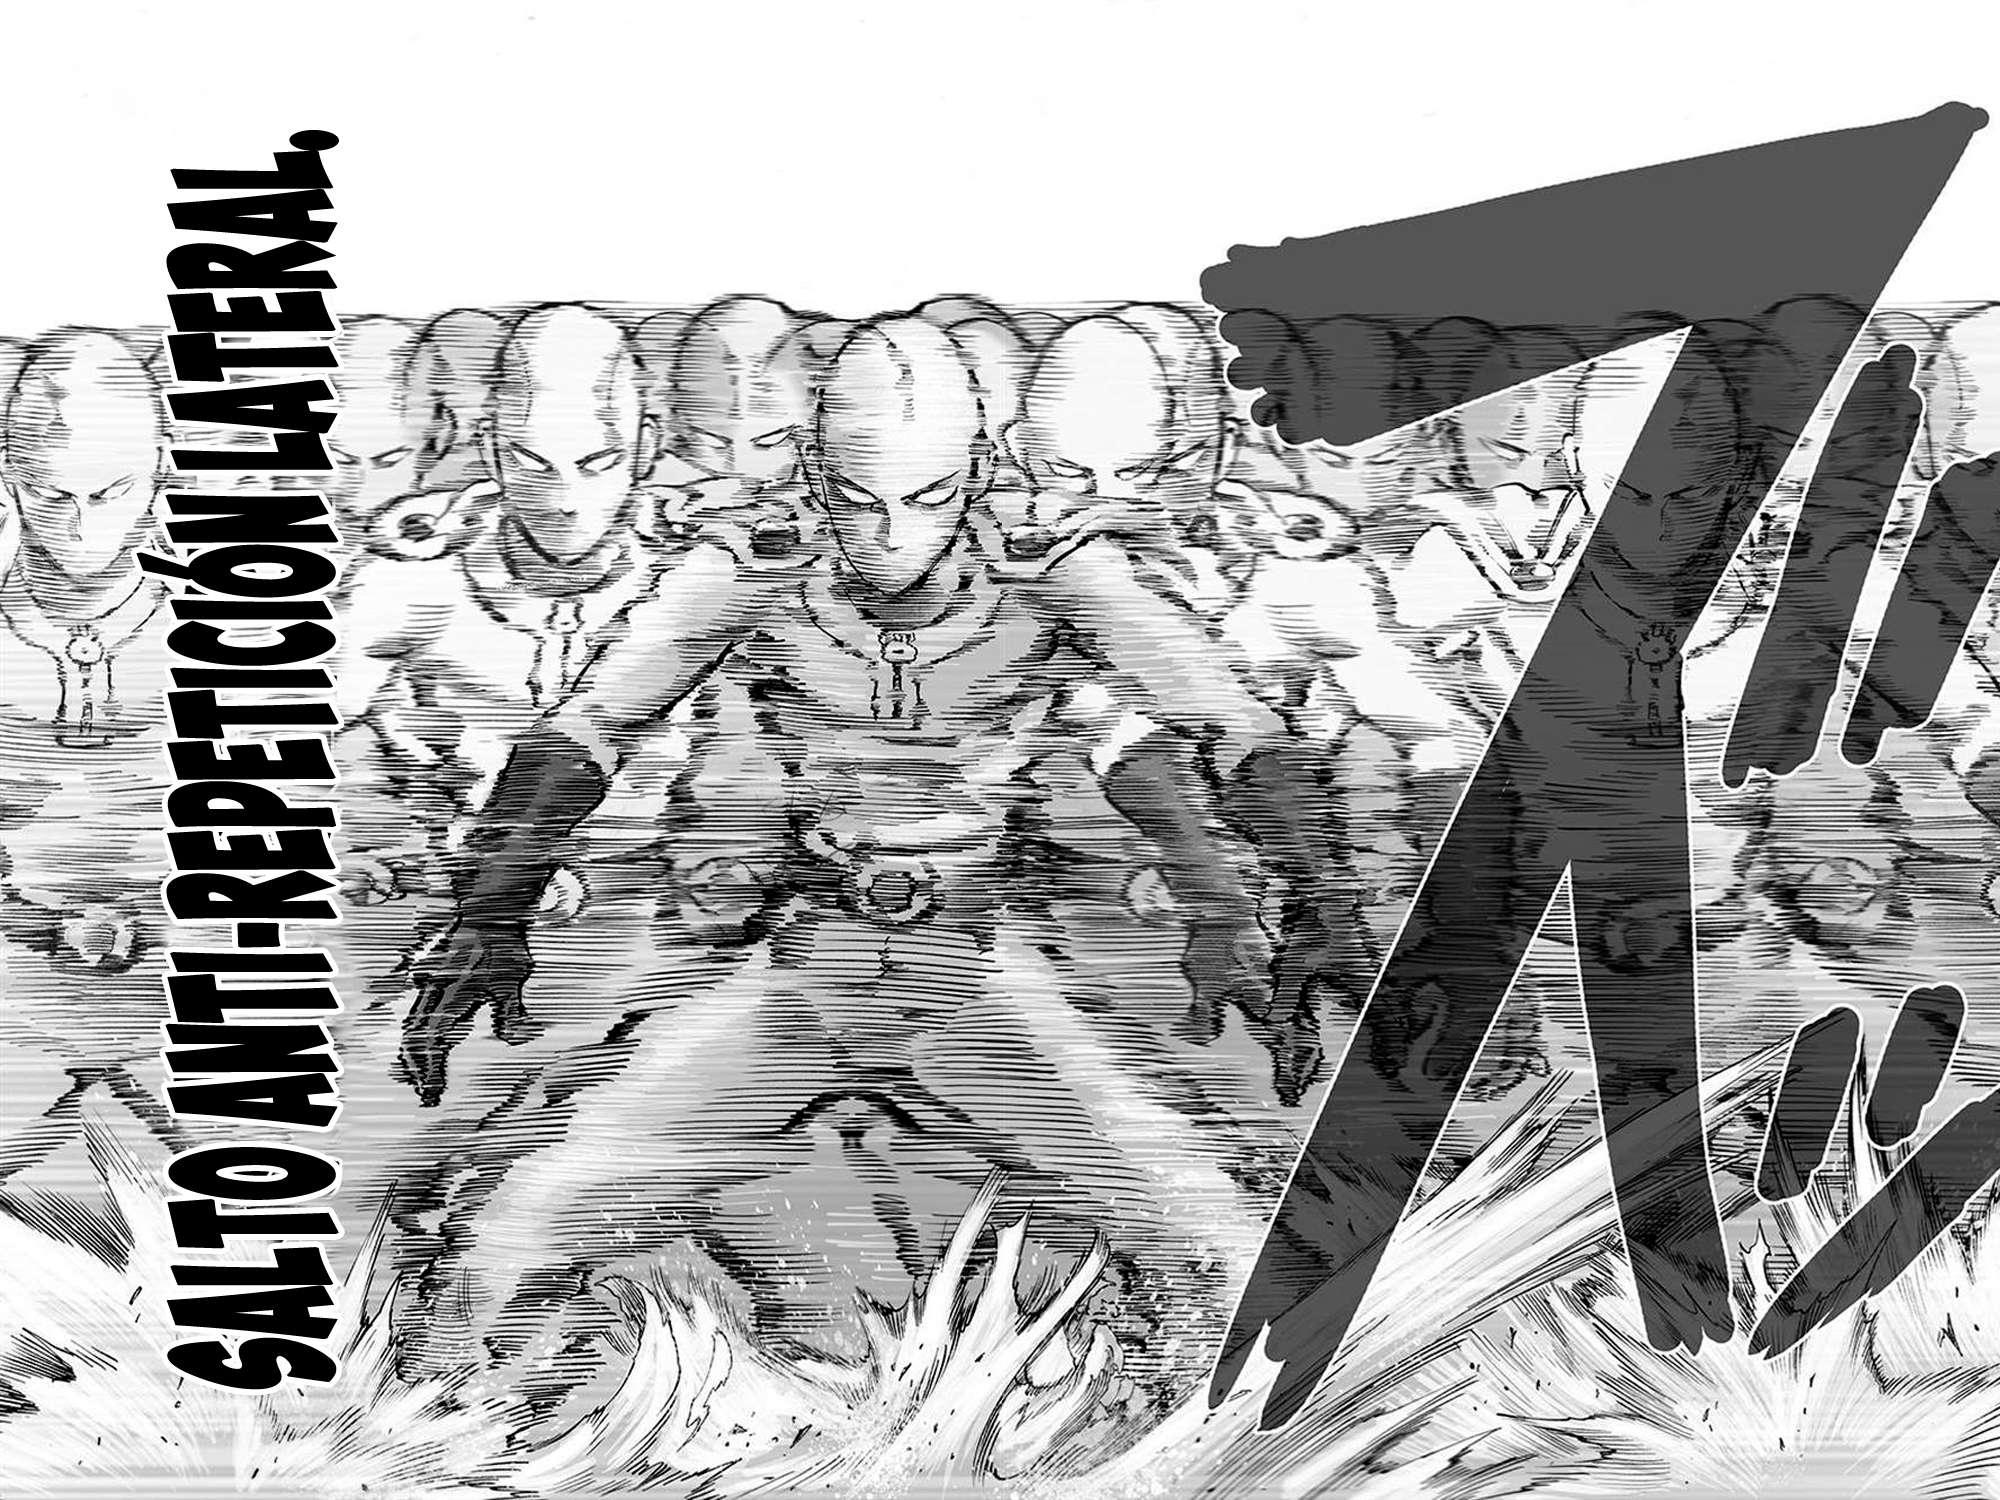 http://c5.ninemanga.com/es_manga/21/14805/362338/68cc2a928d18fc6a91e6c944dc8538d0.jpg Page 6